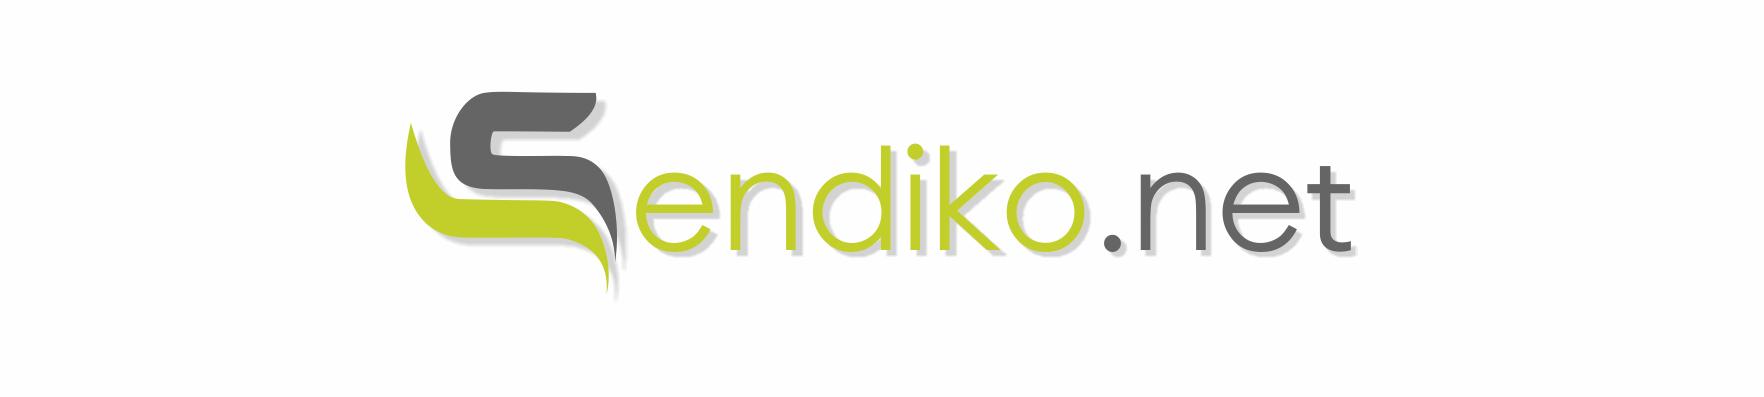 Sendiko.net